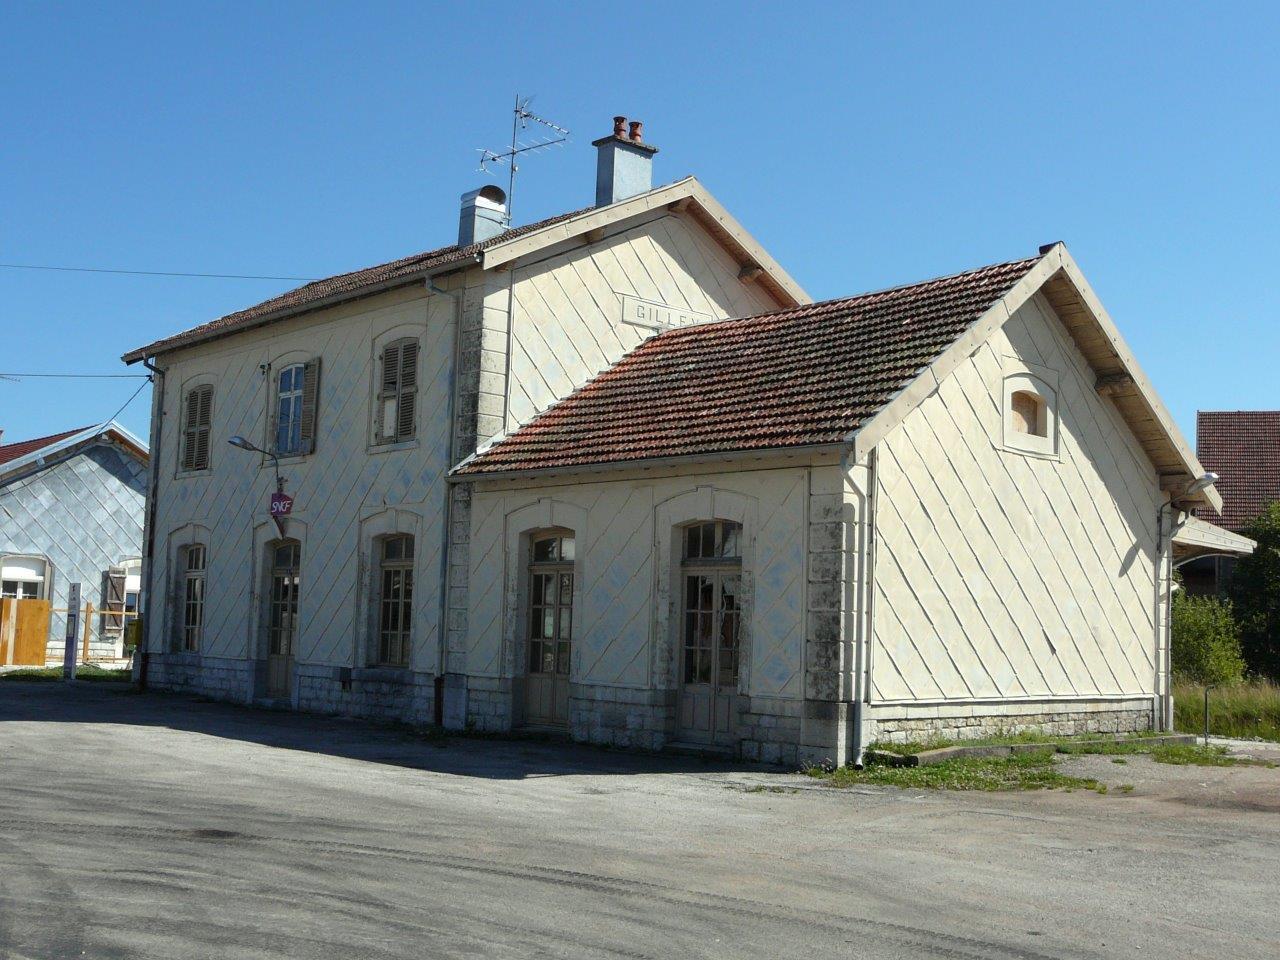 gare-de-gilley-train-station